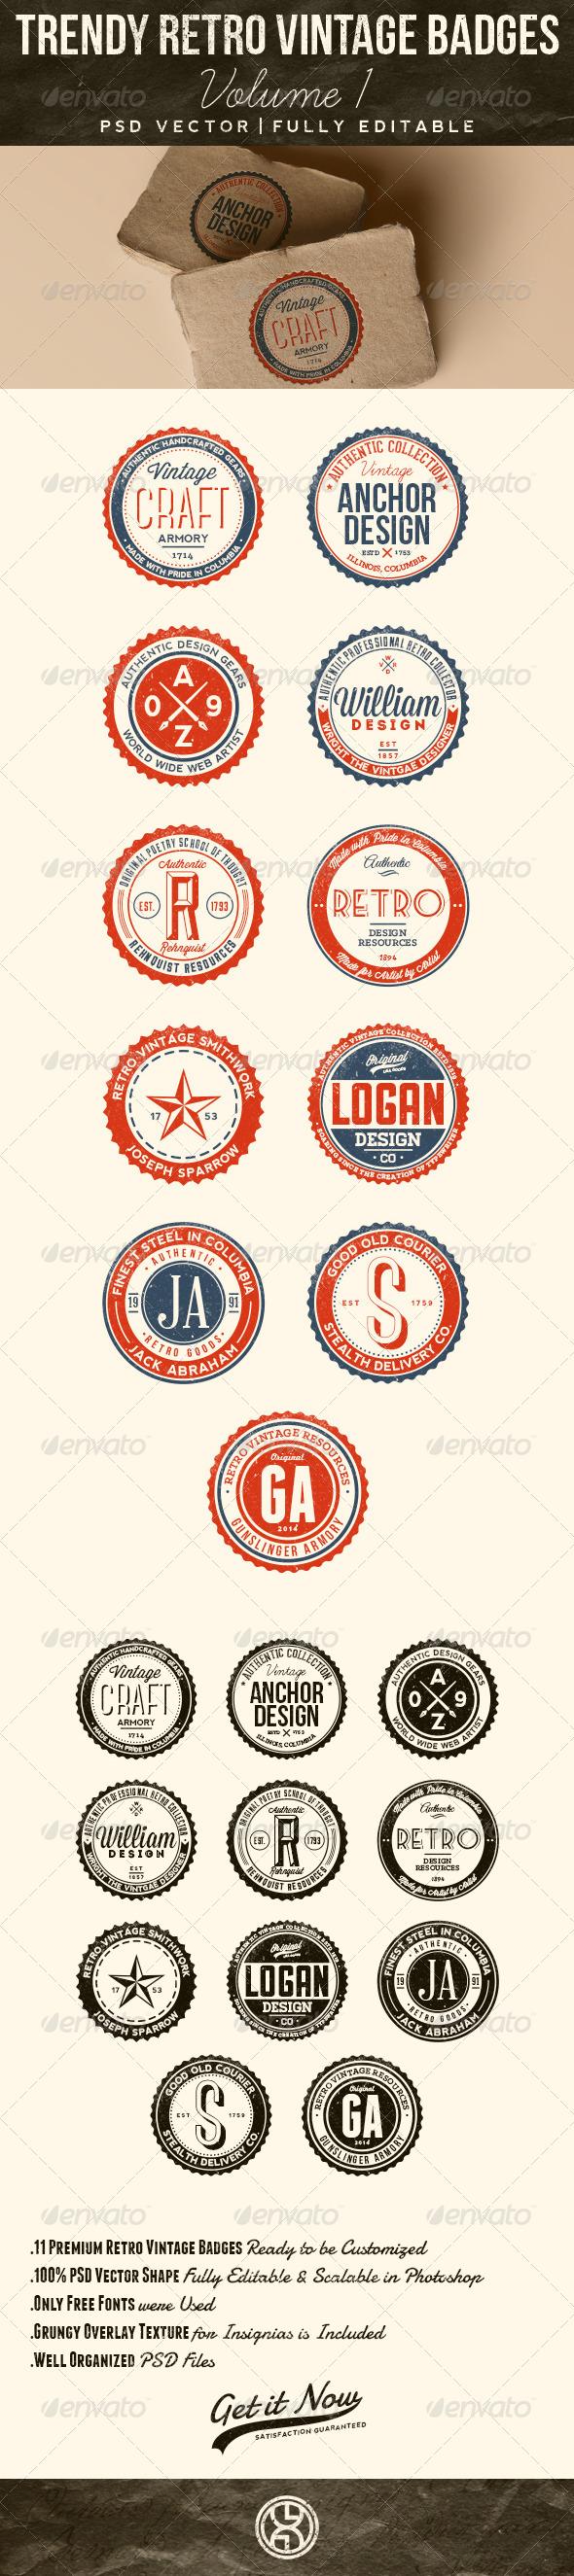 GraphicRiver Trendy Retro Vintage Badges Volume 1 7560715